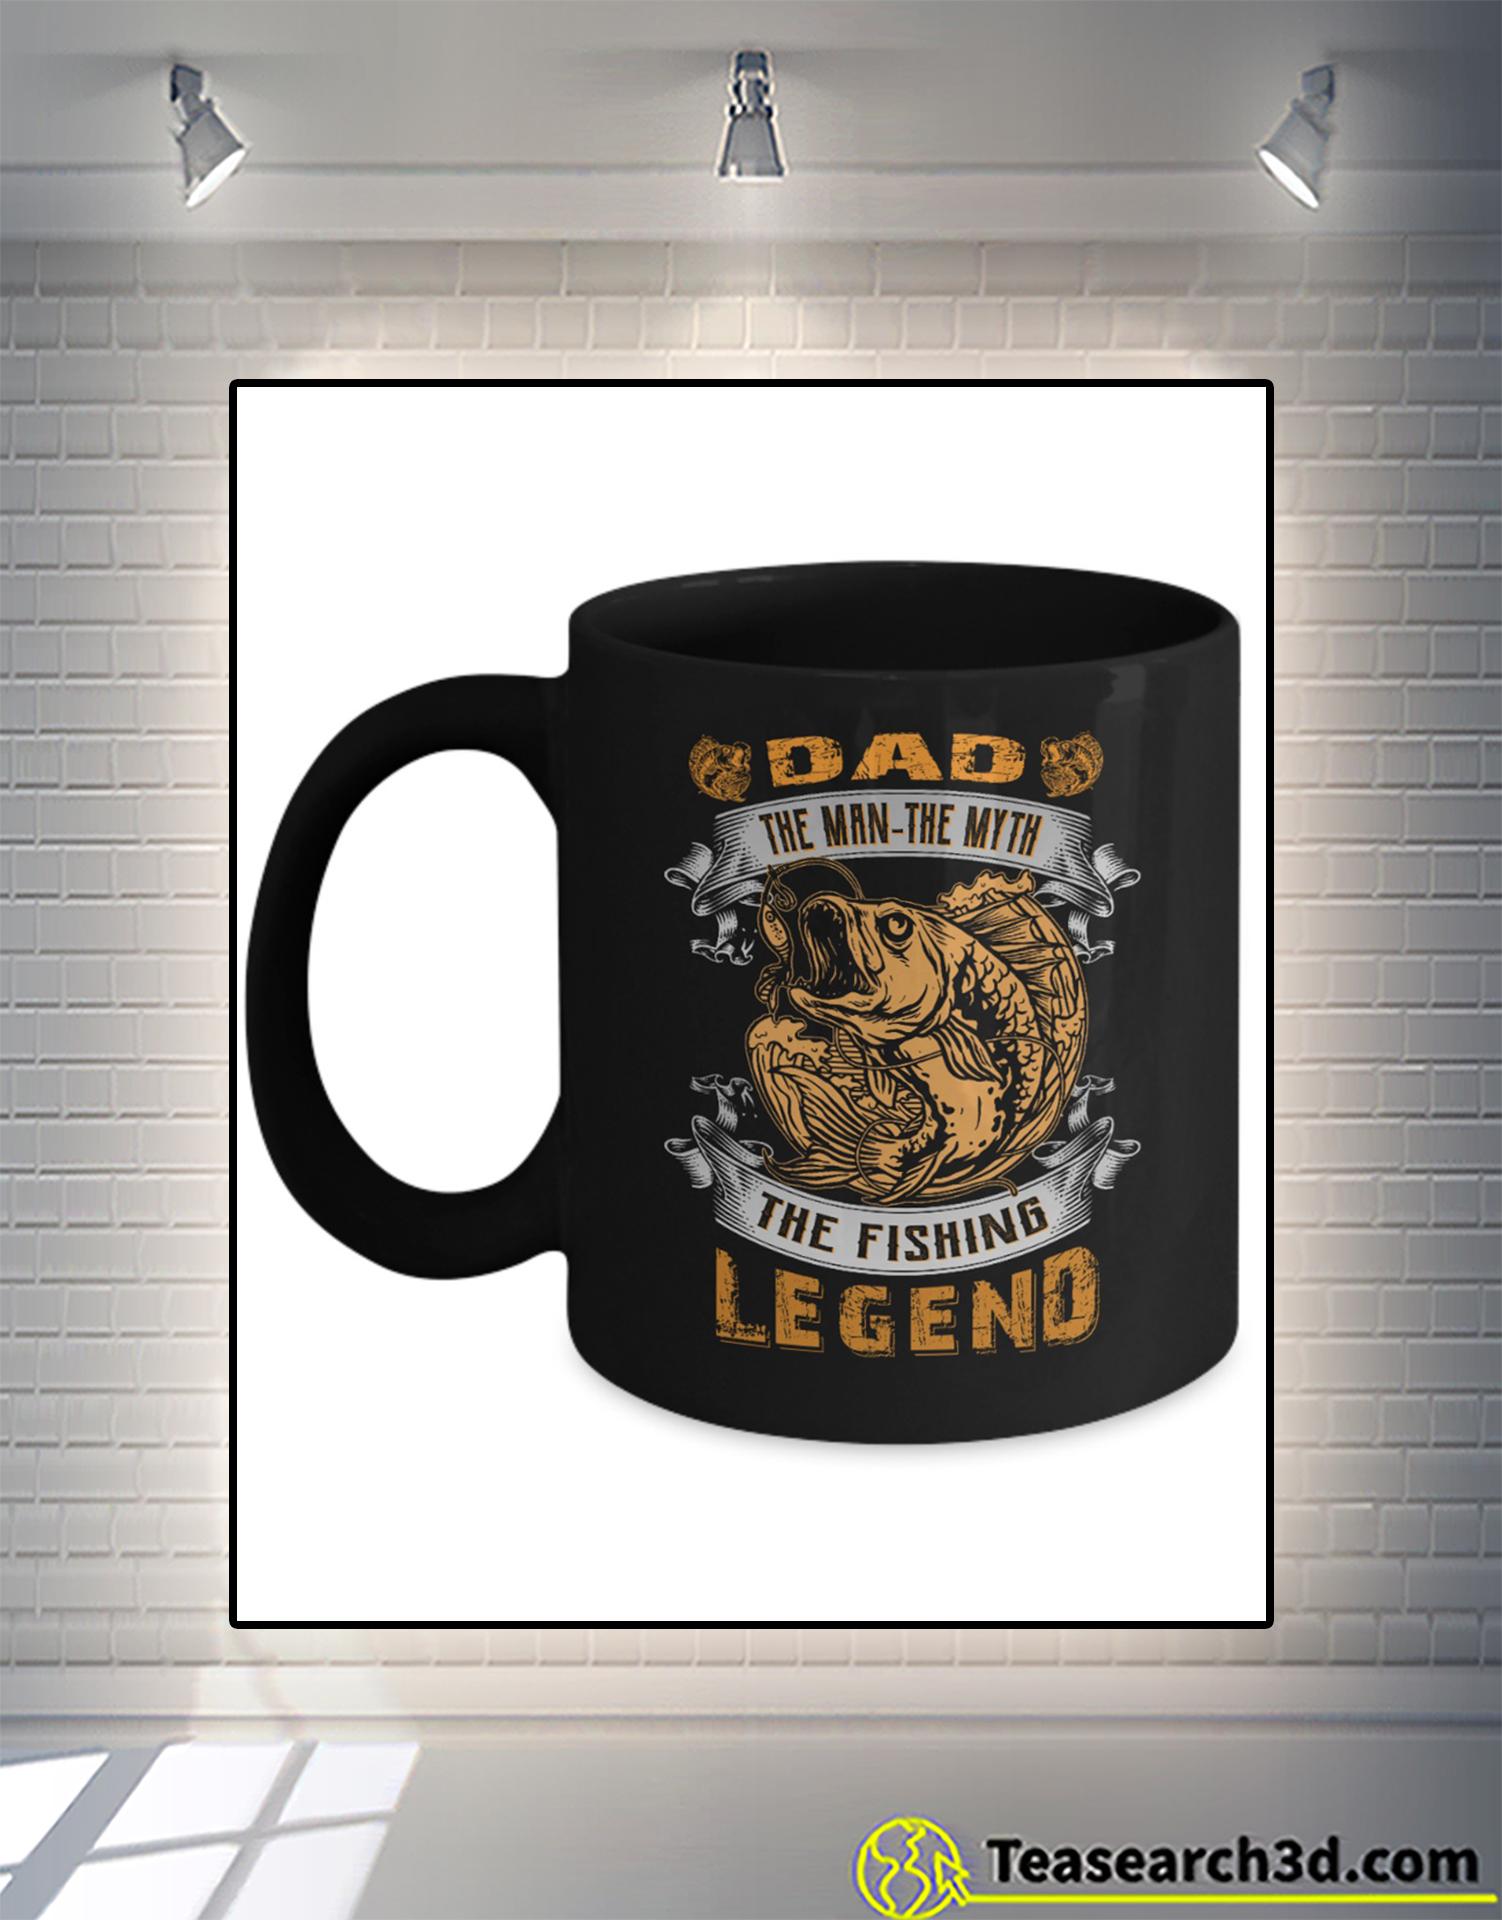 Dad the man the myth the fishing legend mug